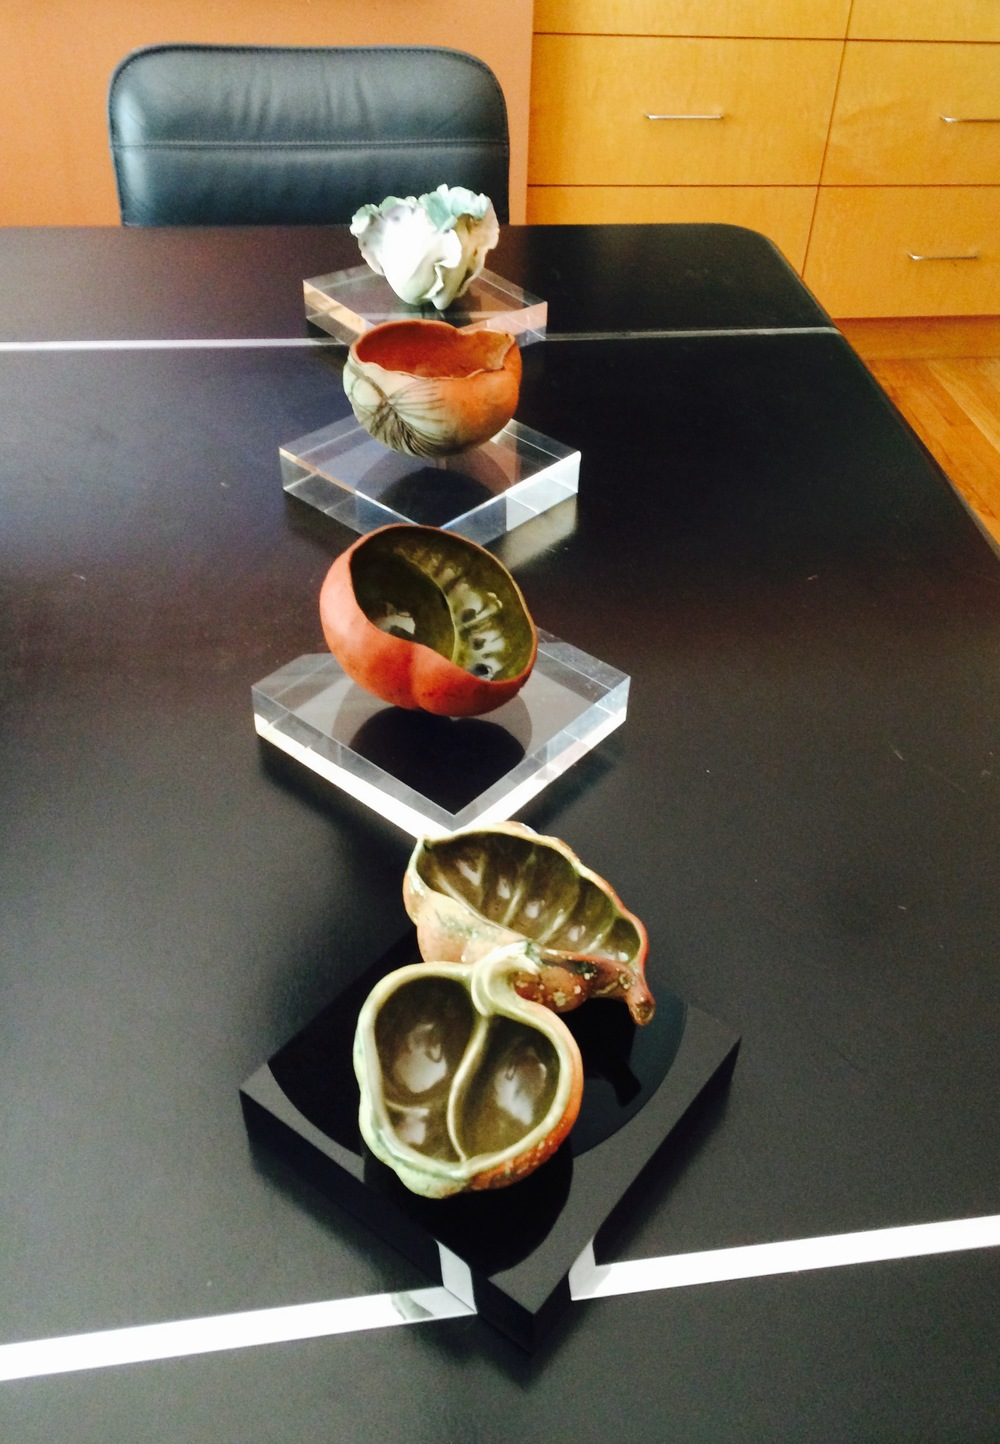 https://alice-ballard.squarespace.com/config#/pages/551ae4efe4b0453e4dfd7b9b|/meditation-bowls-1